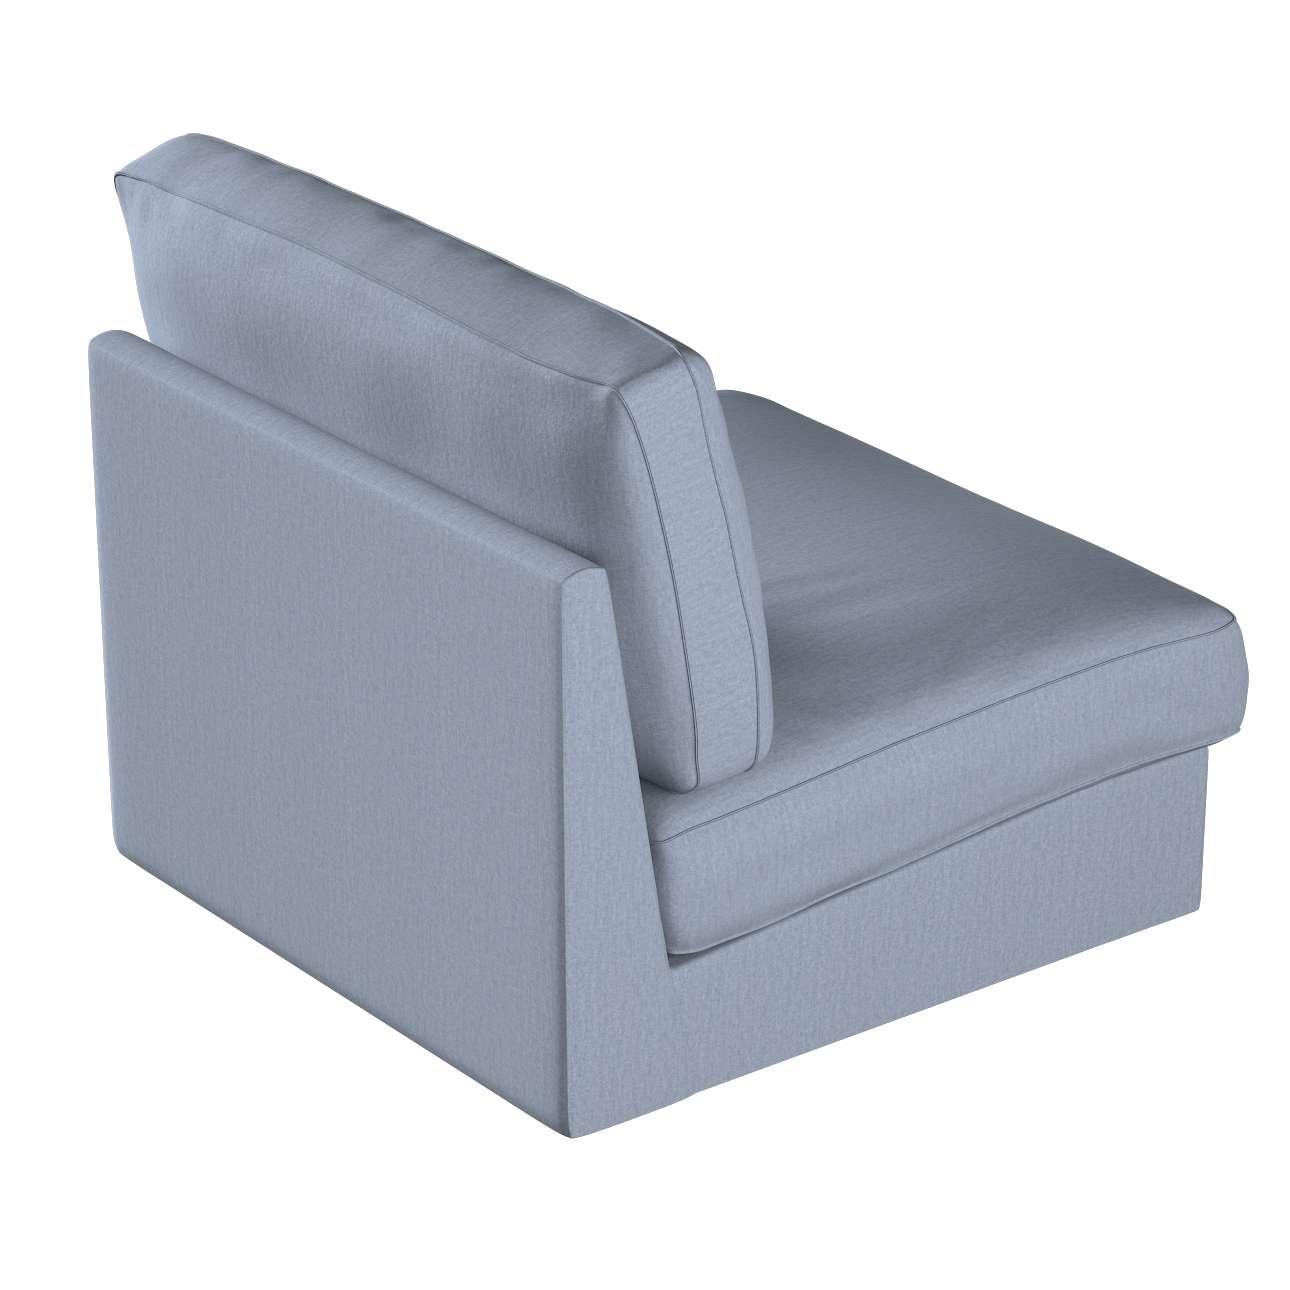 Pokrowiec na fotel Kivik w kolekcji Chenille, tkanina: 702-13